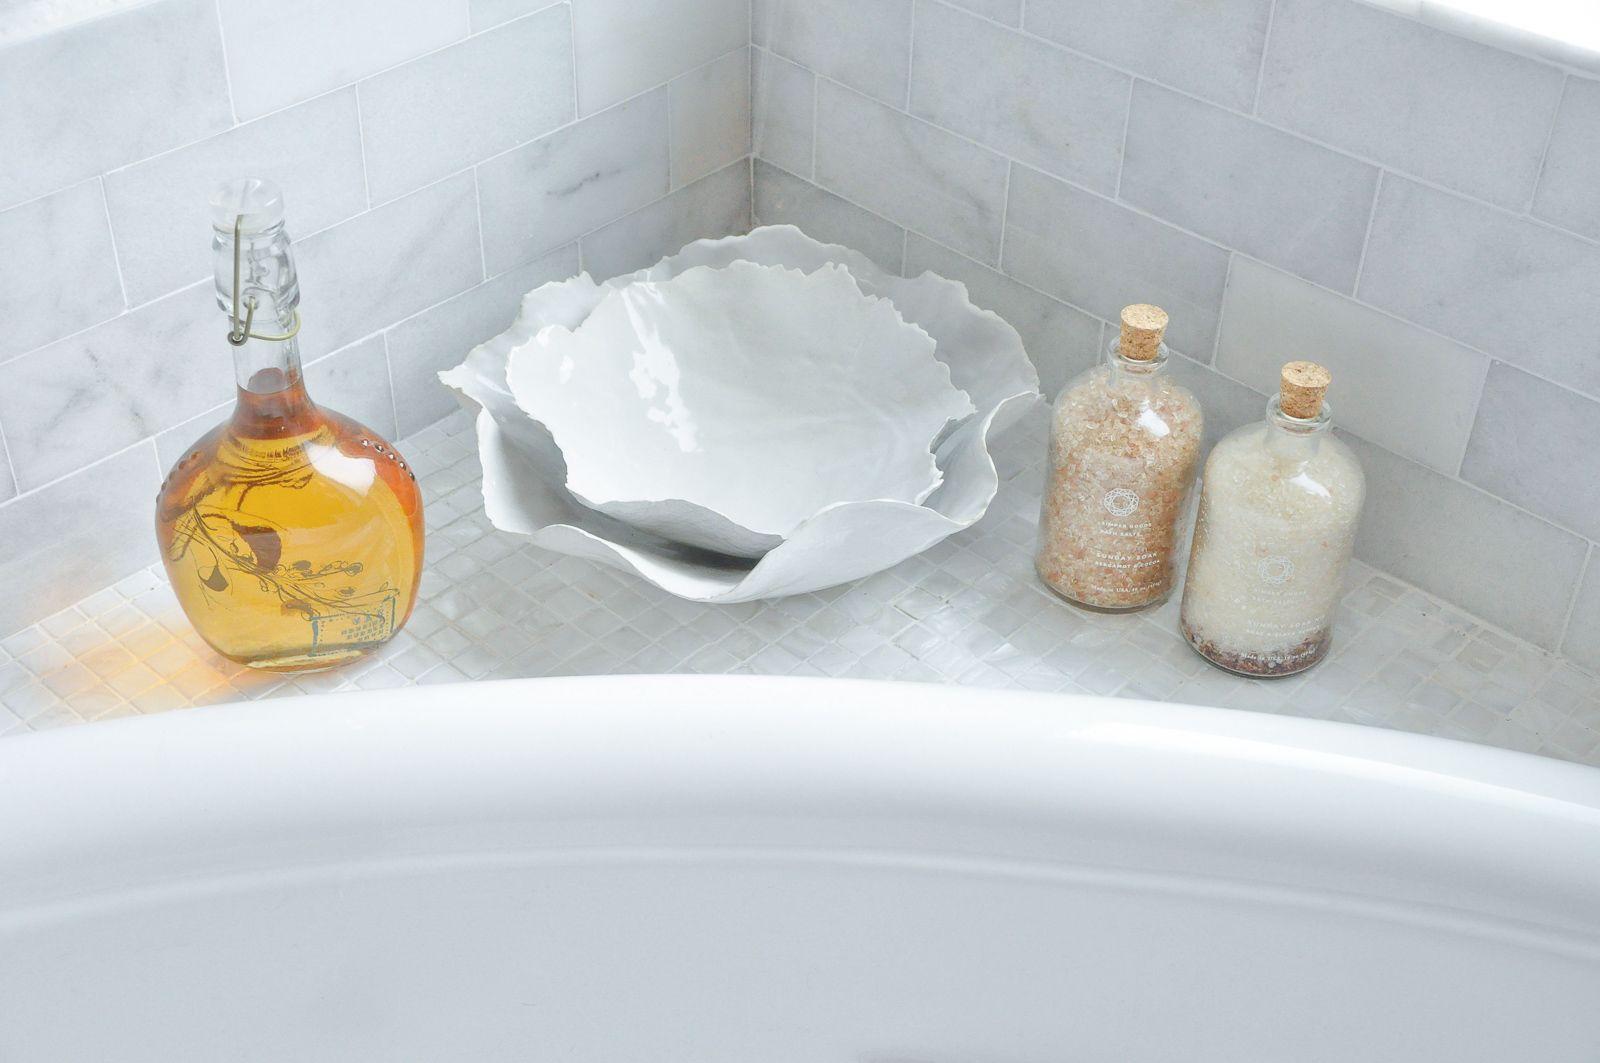 Master bathroom reveal tile #interiordecor #homeinspo #inspohome #decoratingideas #decorinspiration #homedetails  #homedecor #masterbathroom #bathrooms #bathroomdecor #bathroomdesign #interiorinspo #decor #decorating #styleathome #houseandhome #transitionaldecor